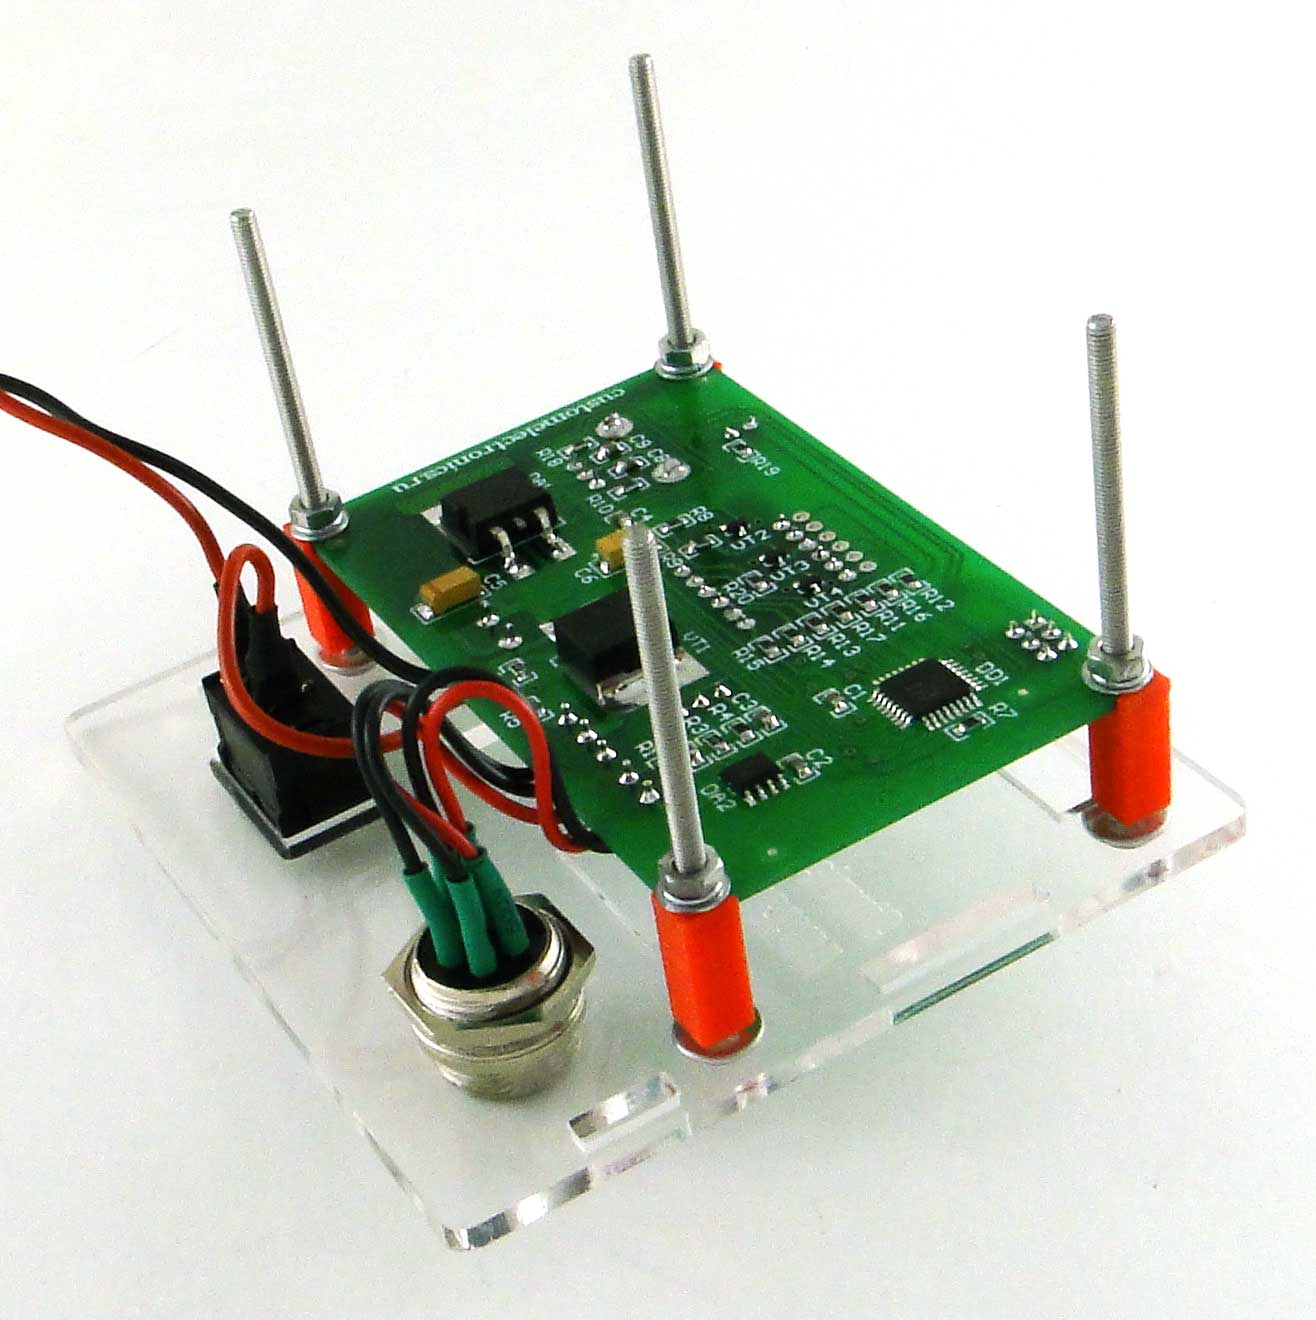 Simple Solder MK936 SMD. Паяльная станция на SMD-компонентах своими руками - 12